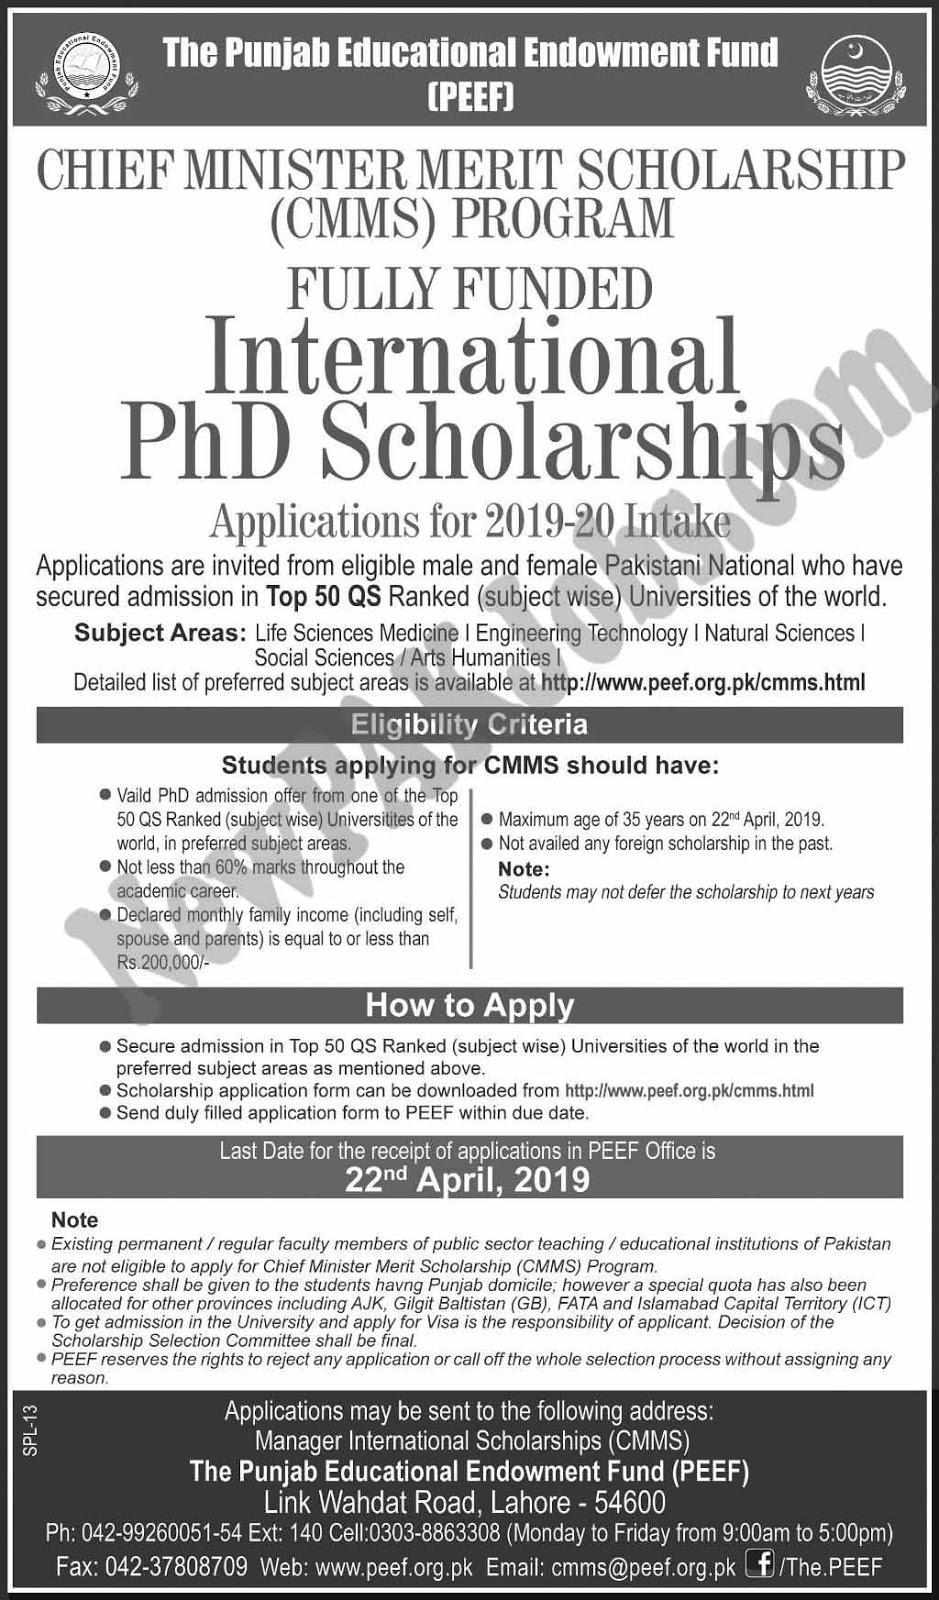 PEEF Scholarship Chief Minister Merit Scholarship CMMS 2019